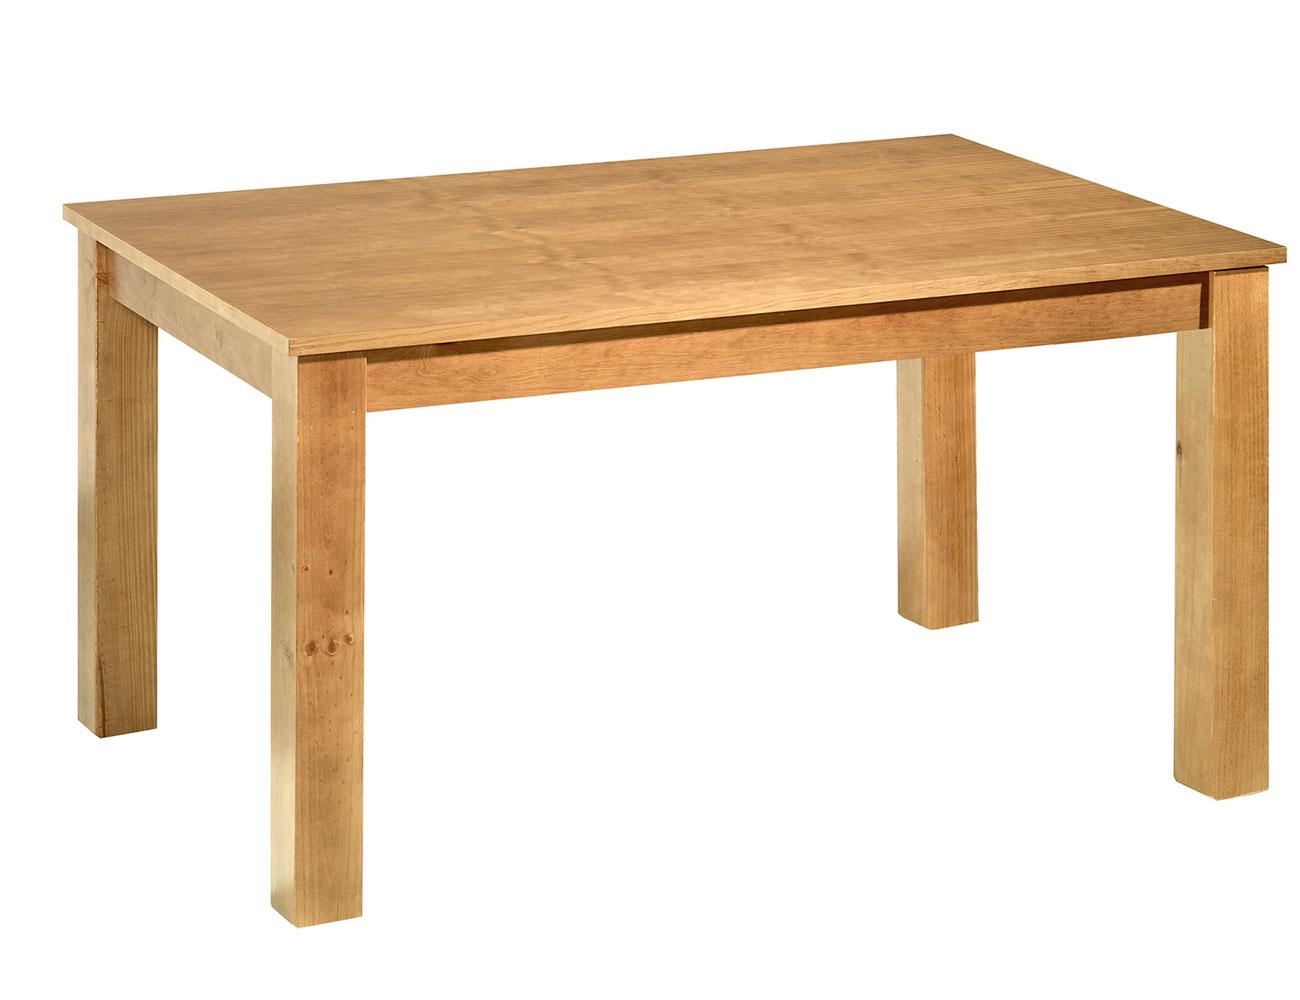 Muebles de sal n comedor de madera de pino en color miel for Muebles de pino color miel